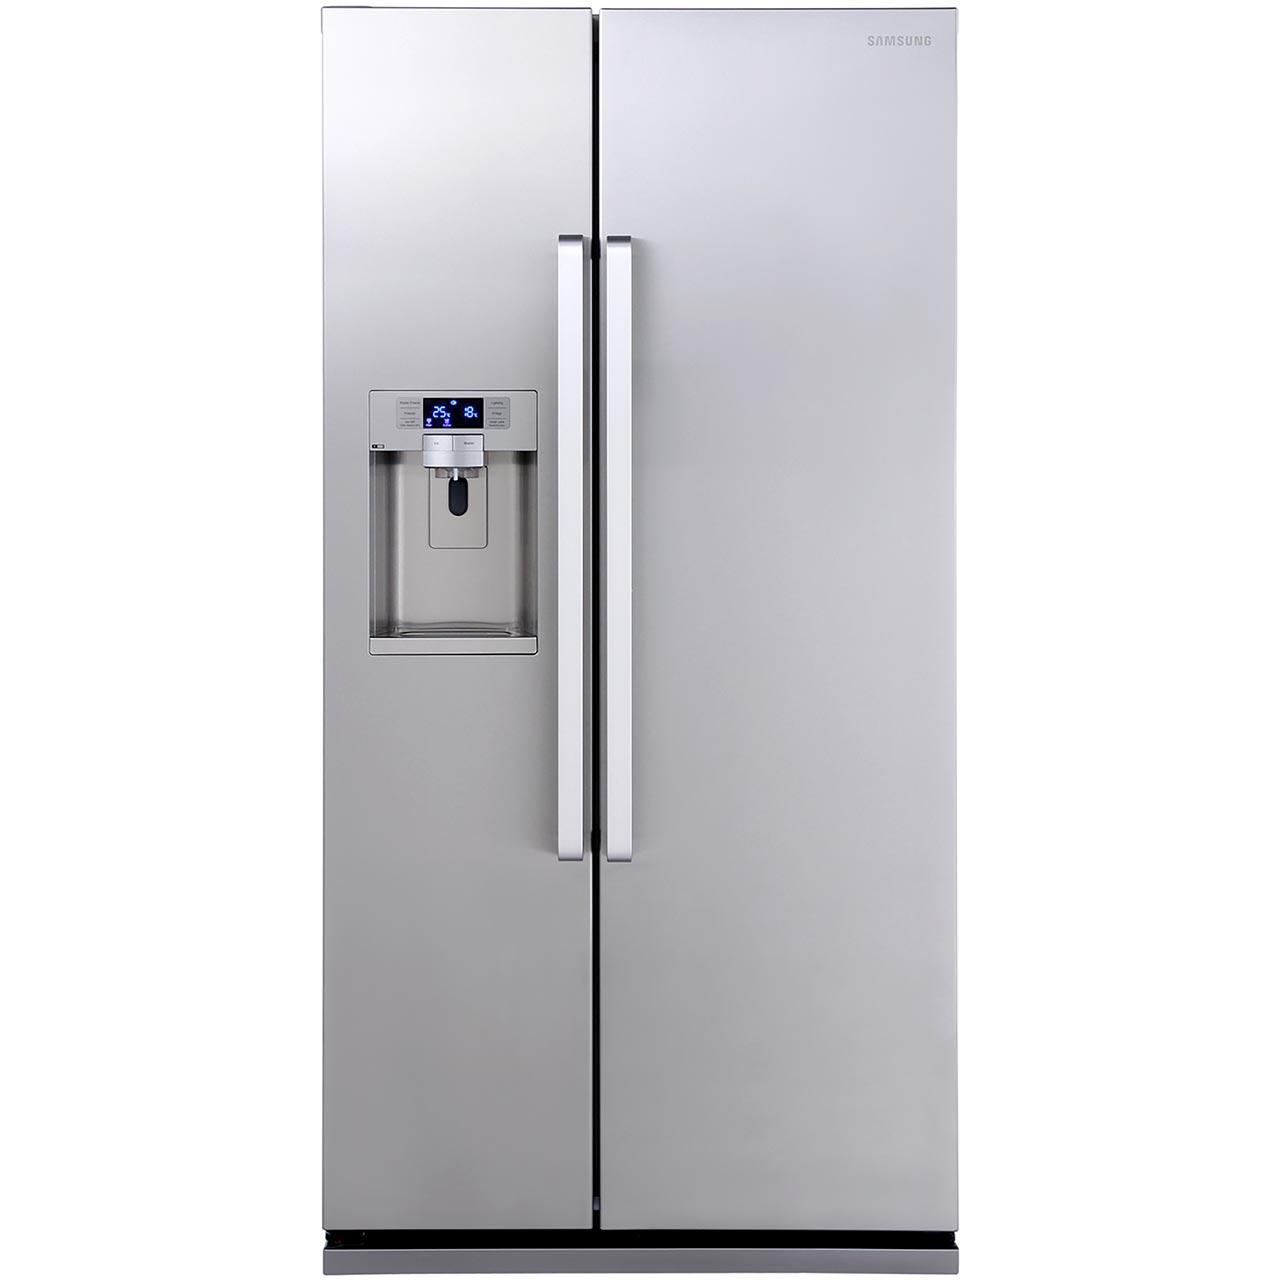 samsung american fridge freezer. samsung american fridge freezer